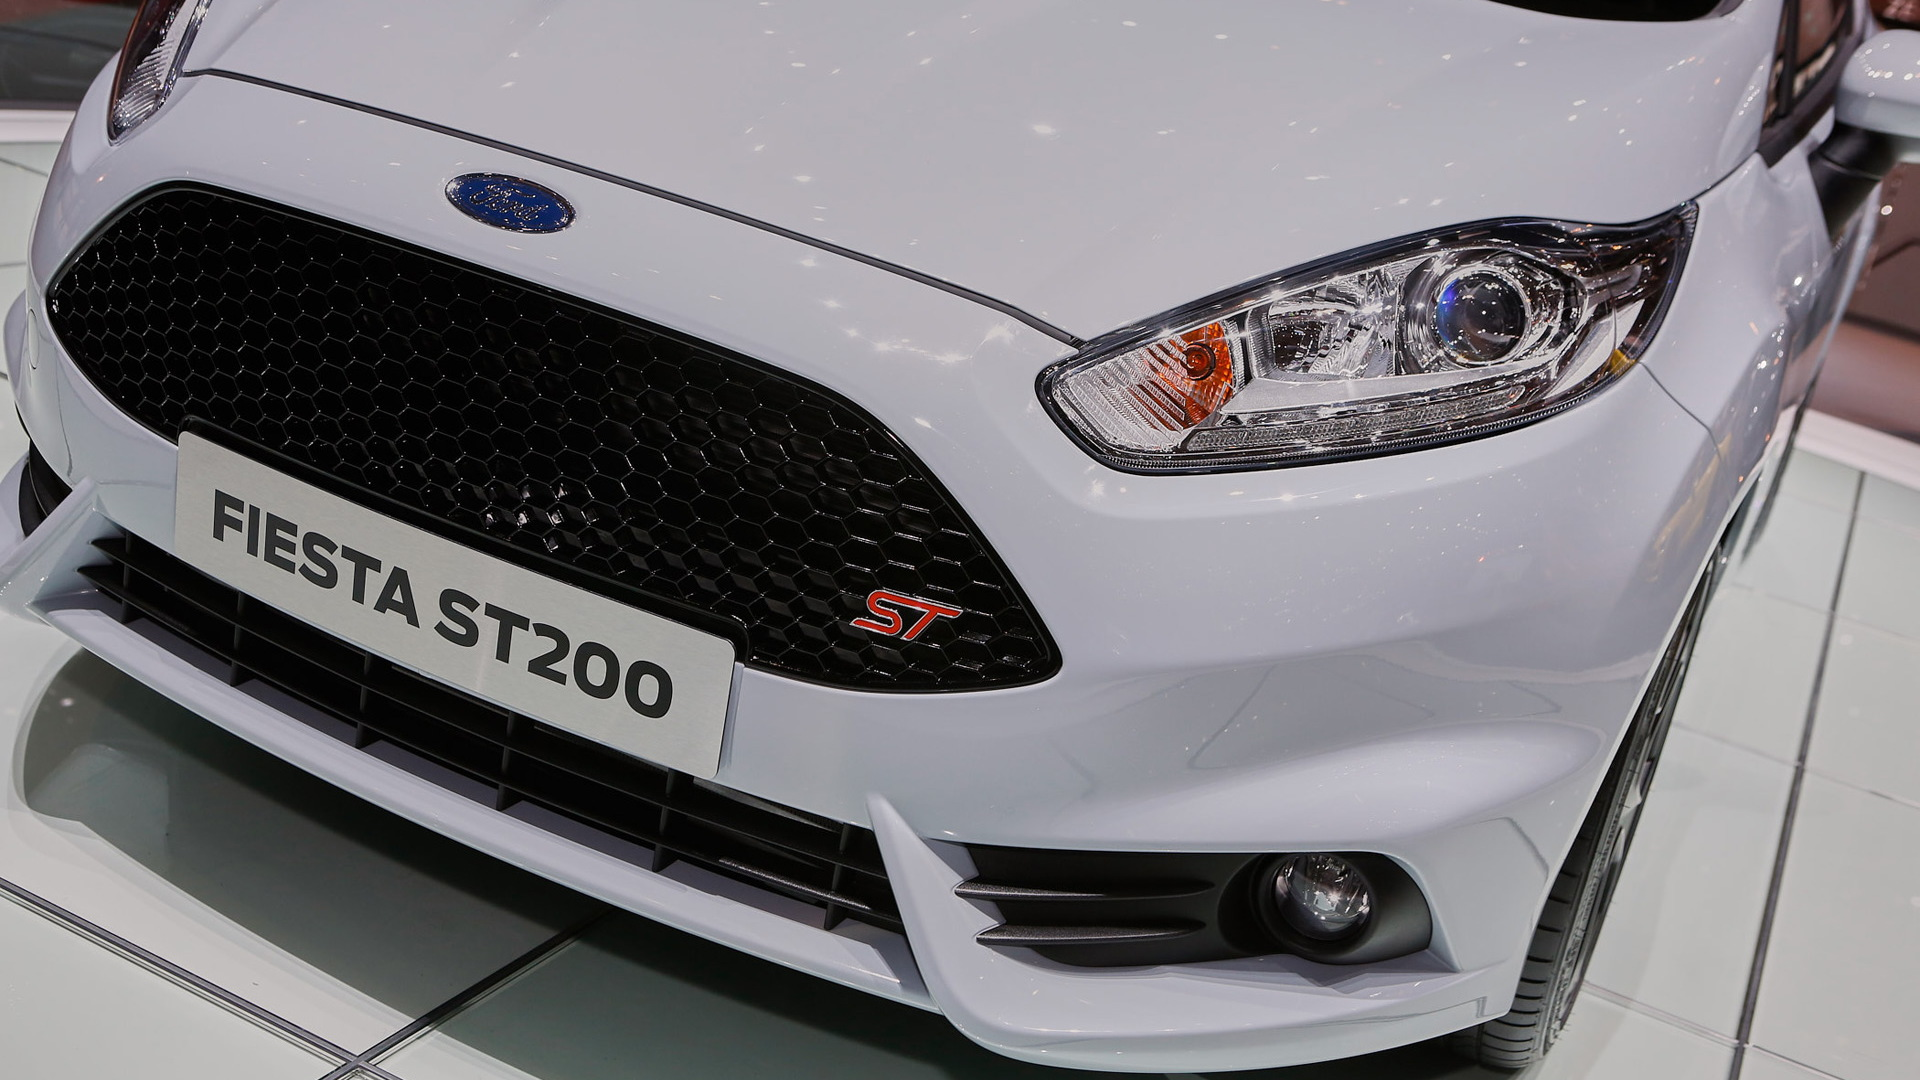 2017 Ford Fiesta ST200, 2016 Geneva Motor Show